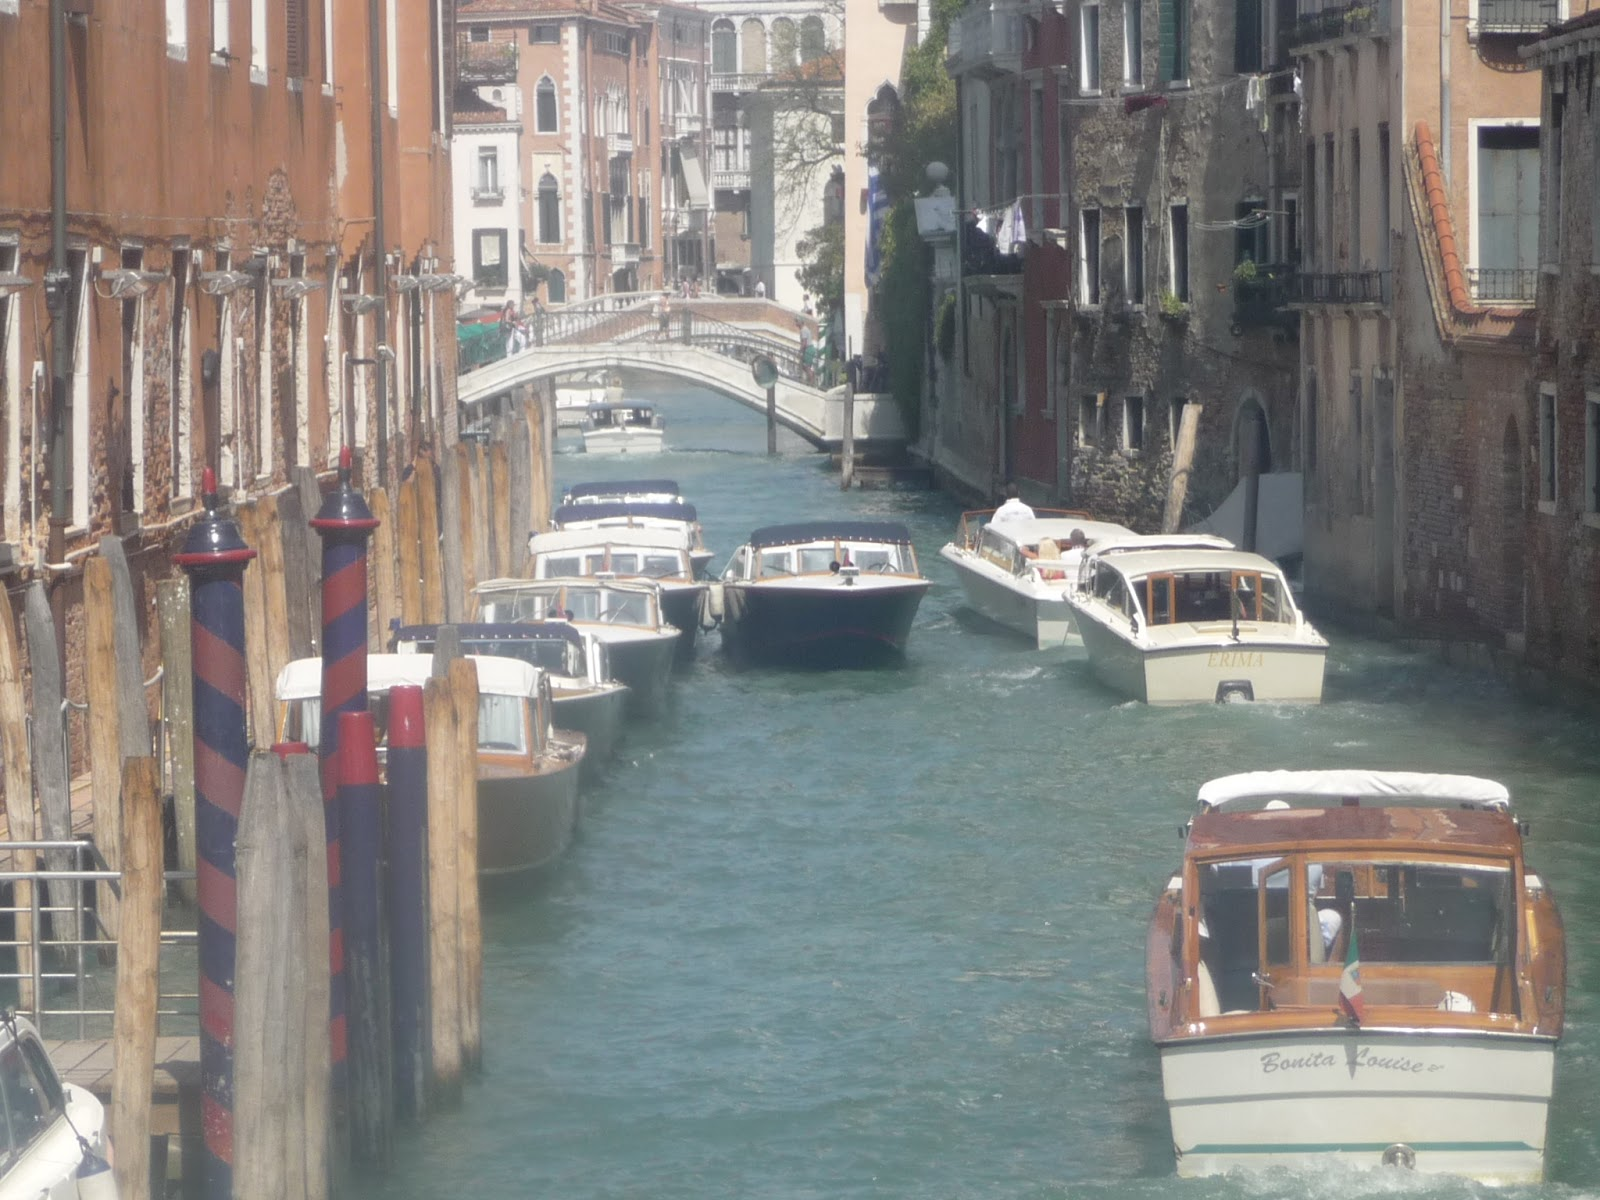 Venezia båter Ni Mater Å ri en båt i Venezia - Italia utøver Det åpenbare